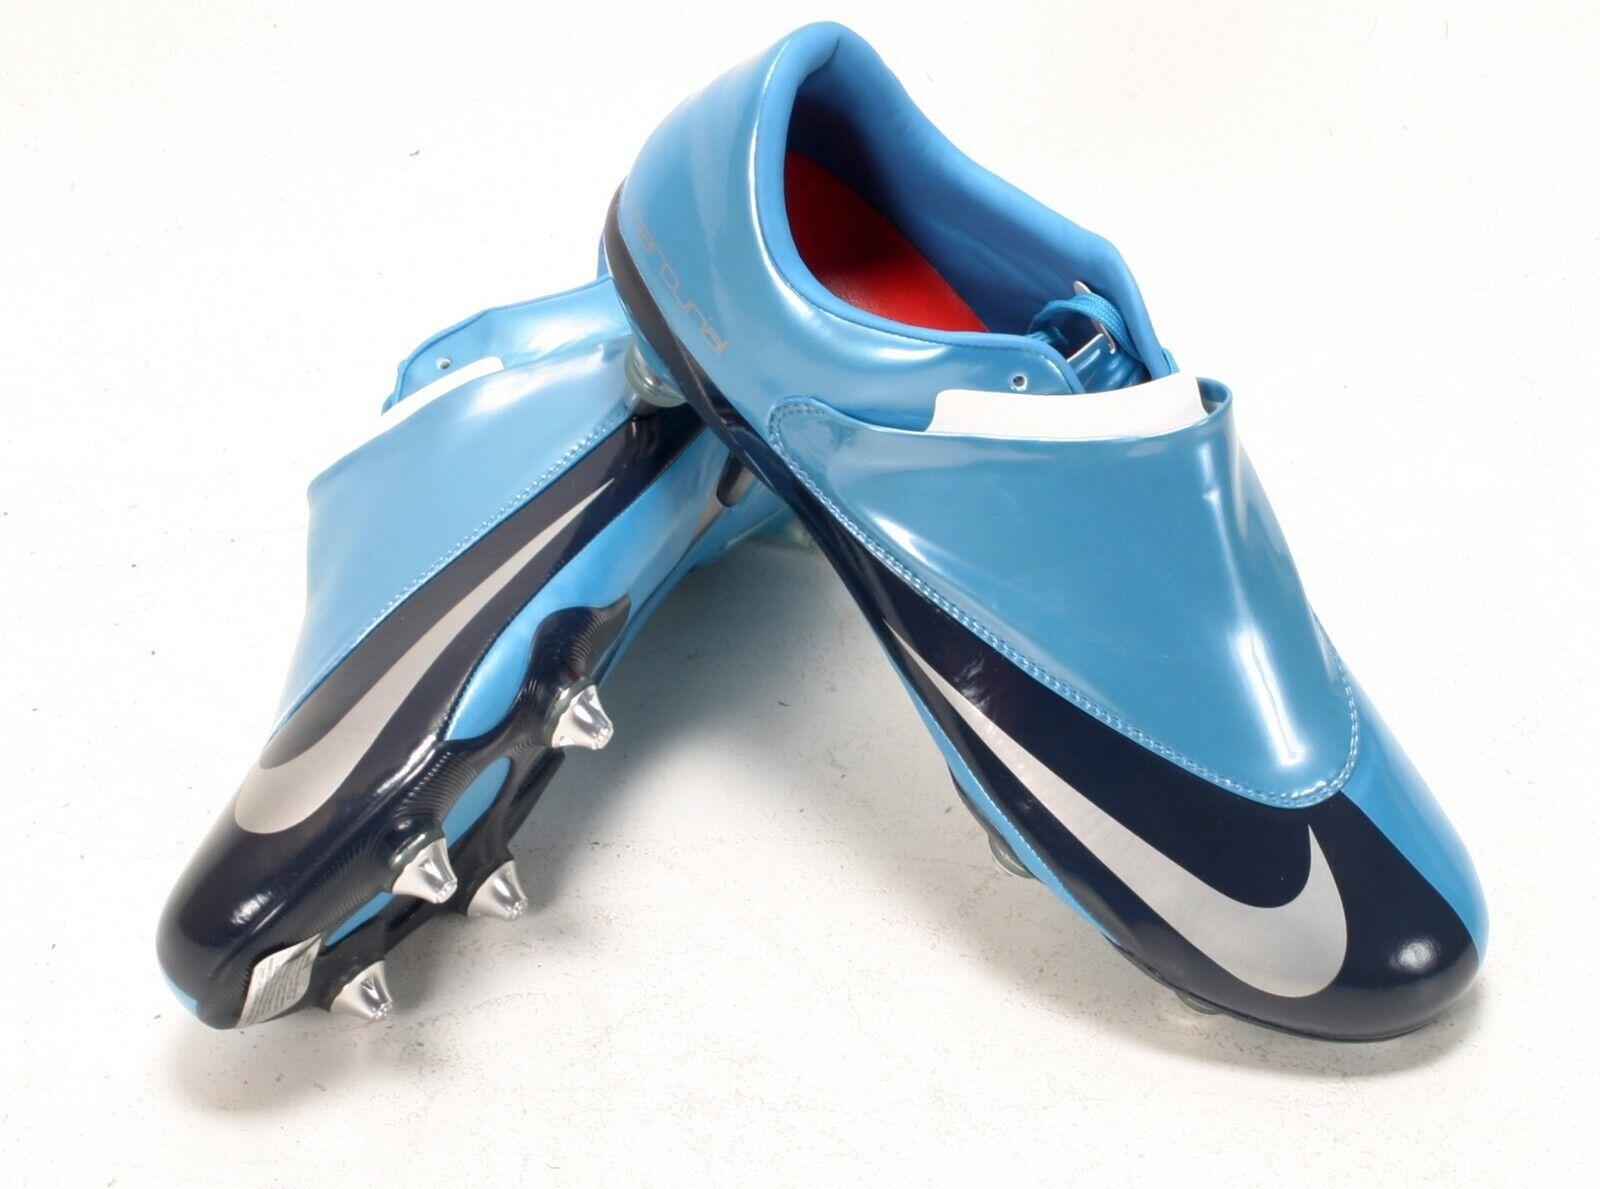 Raro botas De Fútbol Nike Mercurial Vapor II Azul Claro Azul Marino Nuevo Y En Caja9, 13 EU44, 47